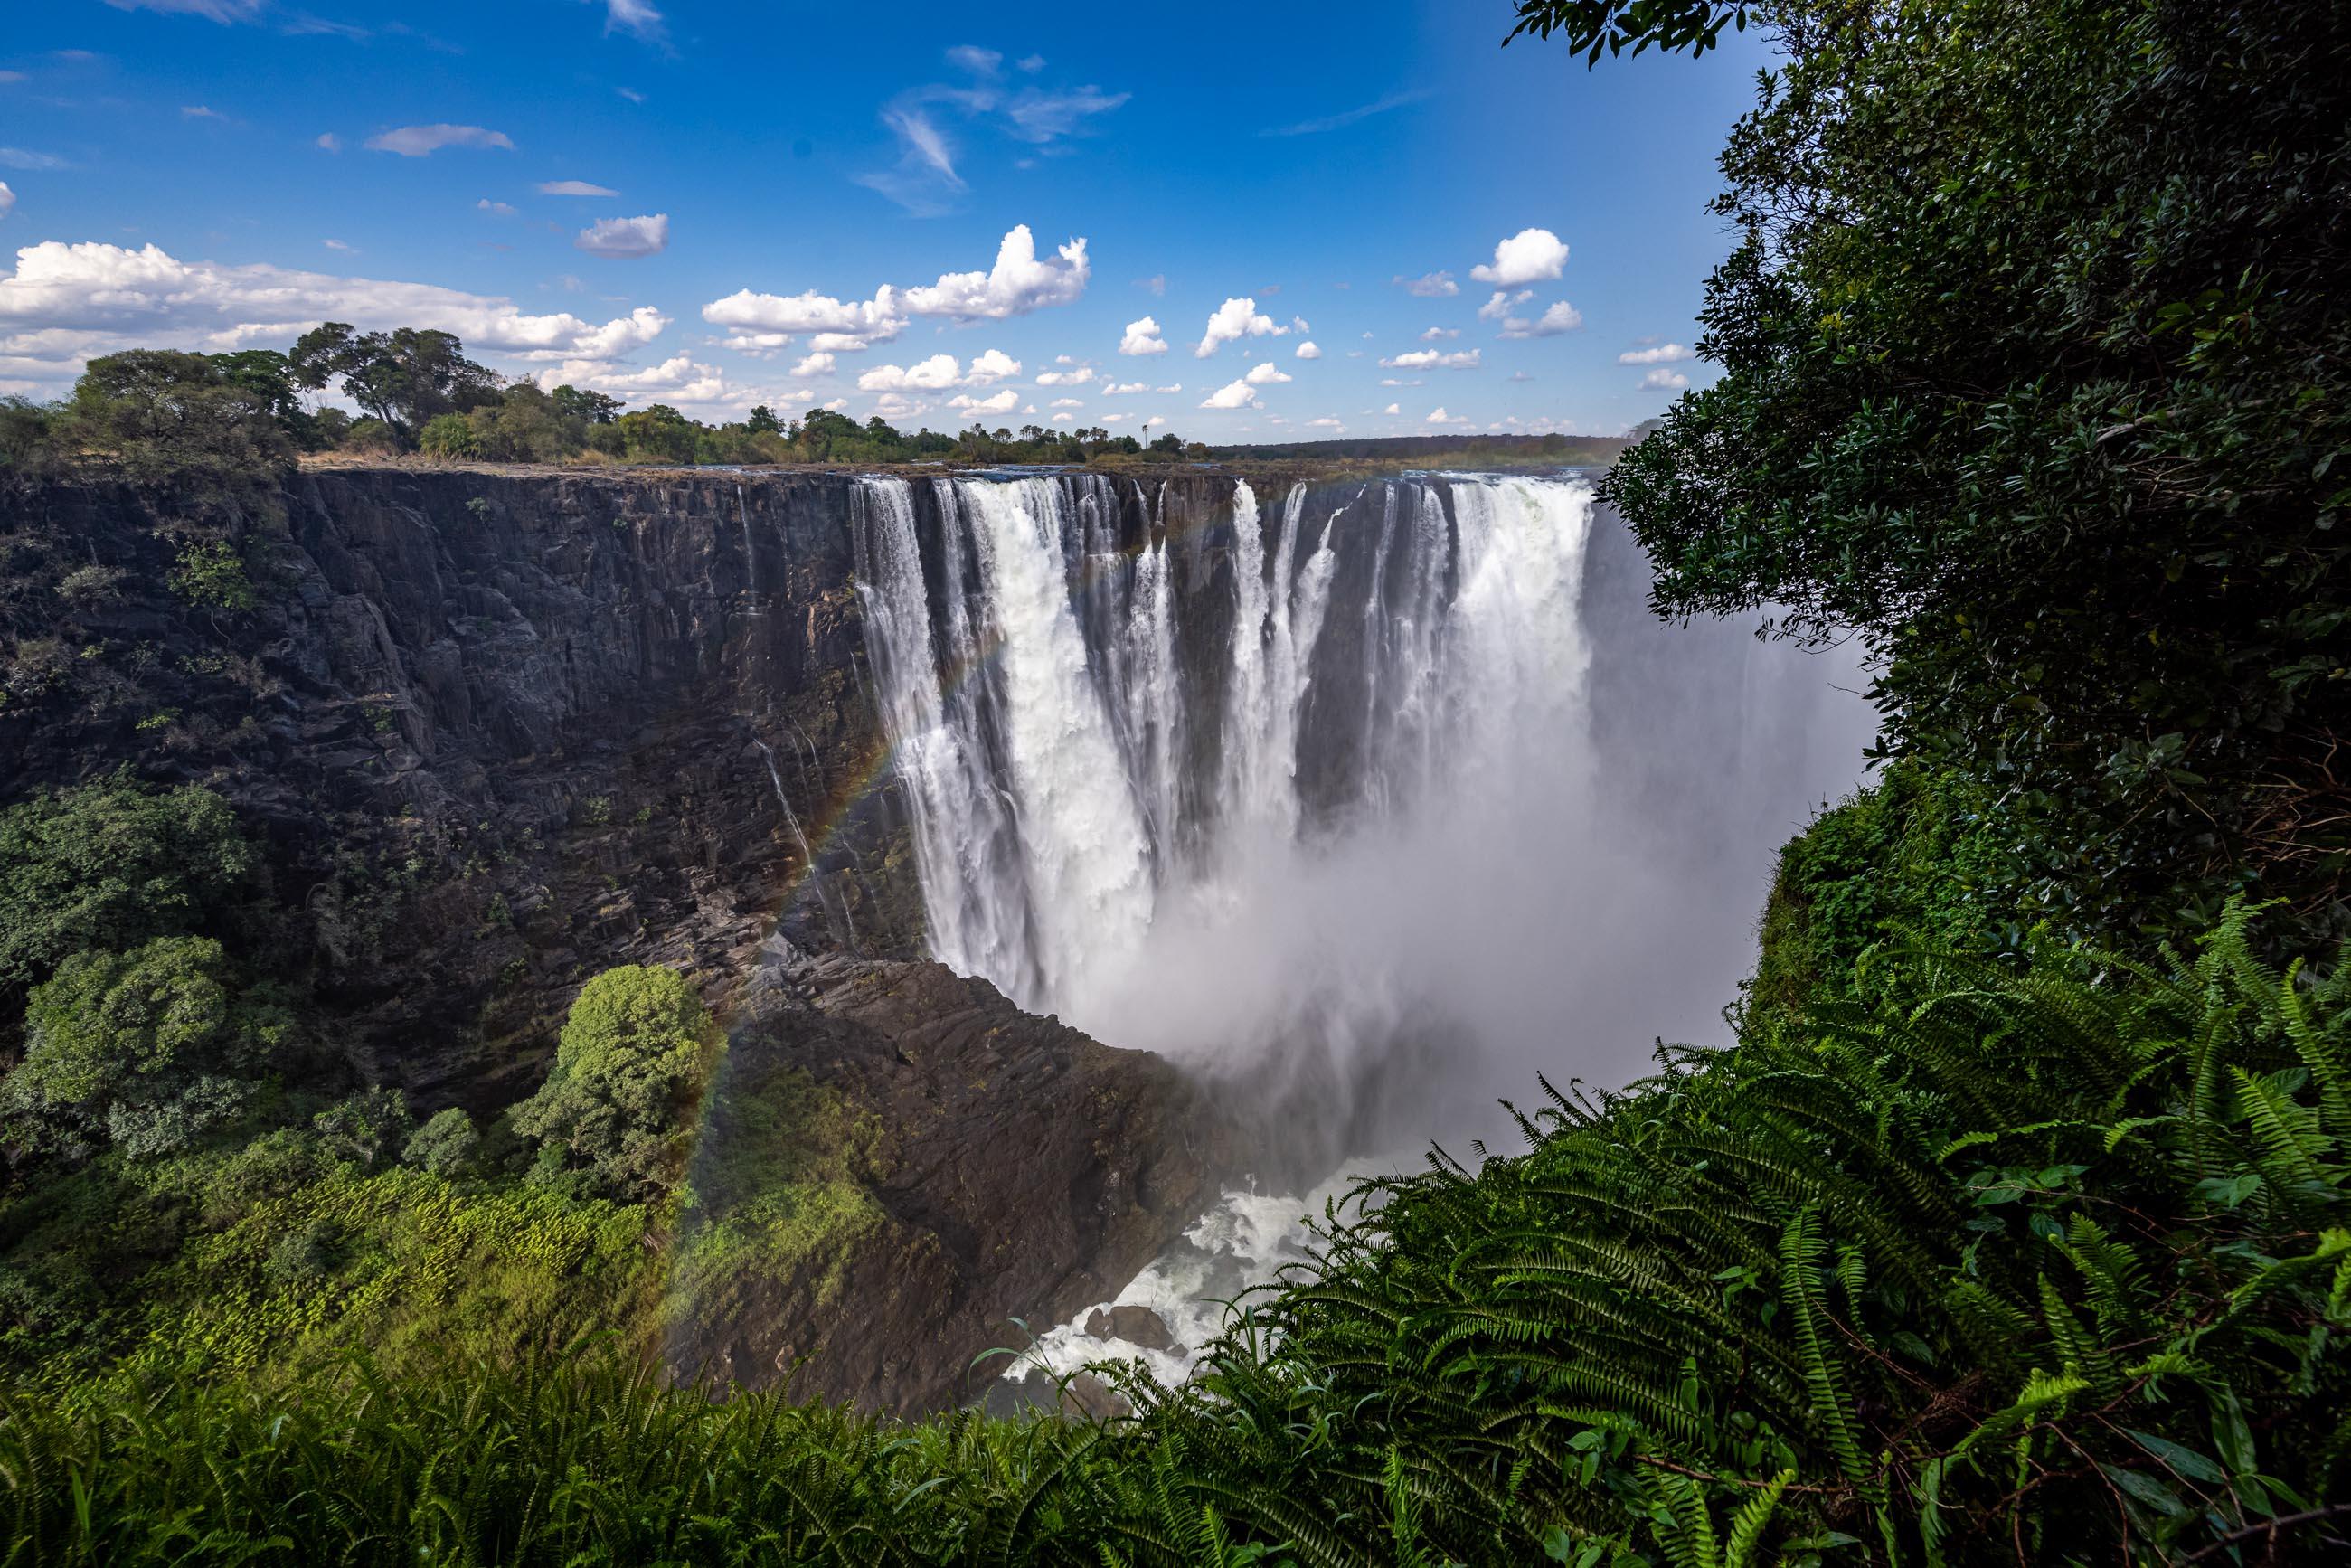 https://bubo.sk/uploads/galleries/7196/tomashulik_zimbabwe_victoriafalls-192-2.jpg